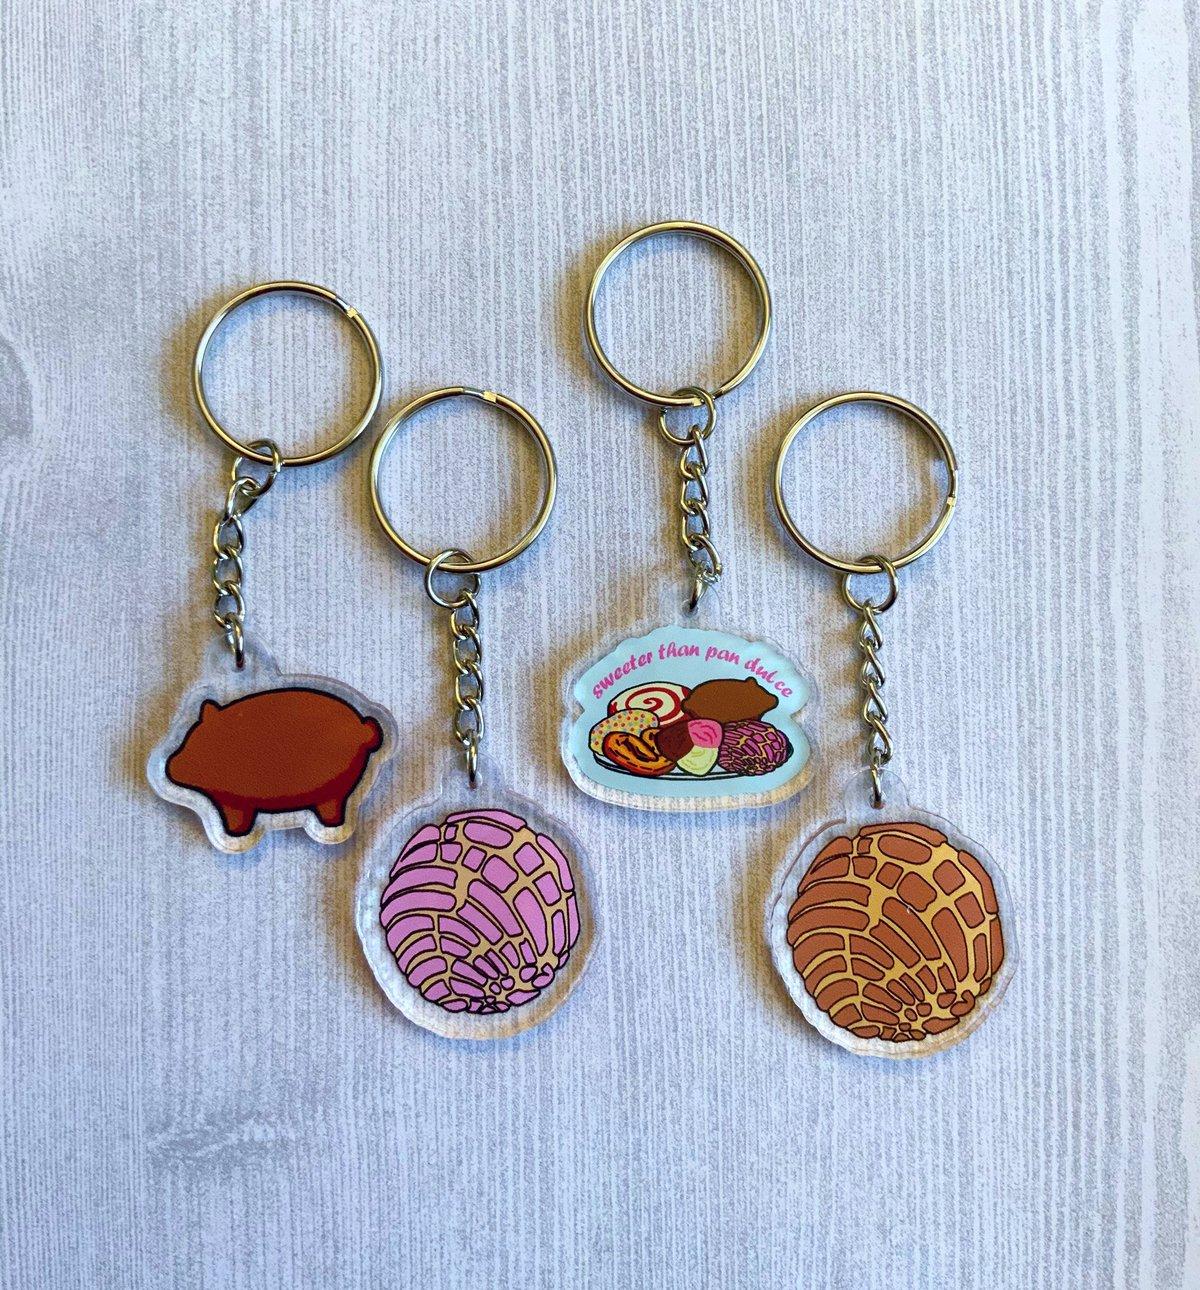 Additional Acrylic Keychains